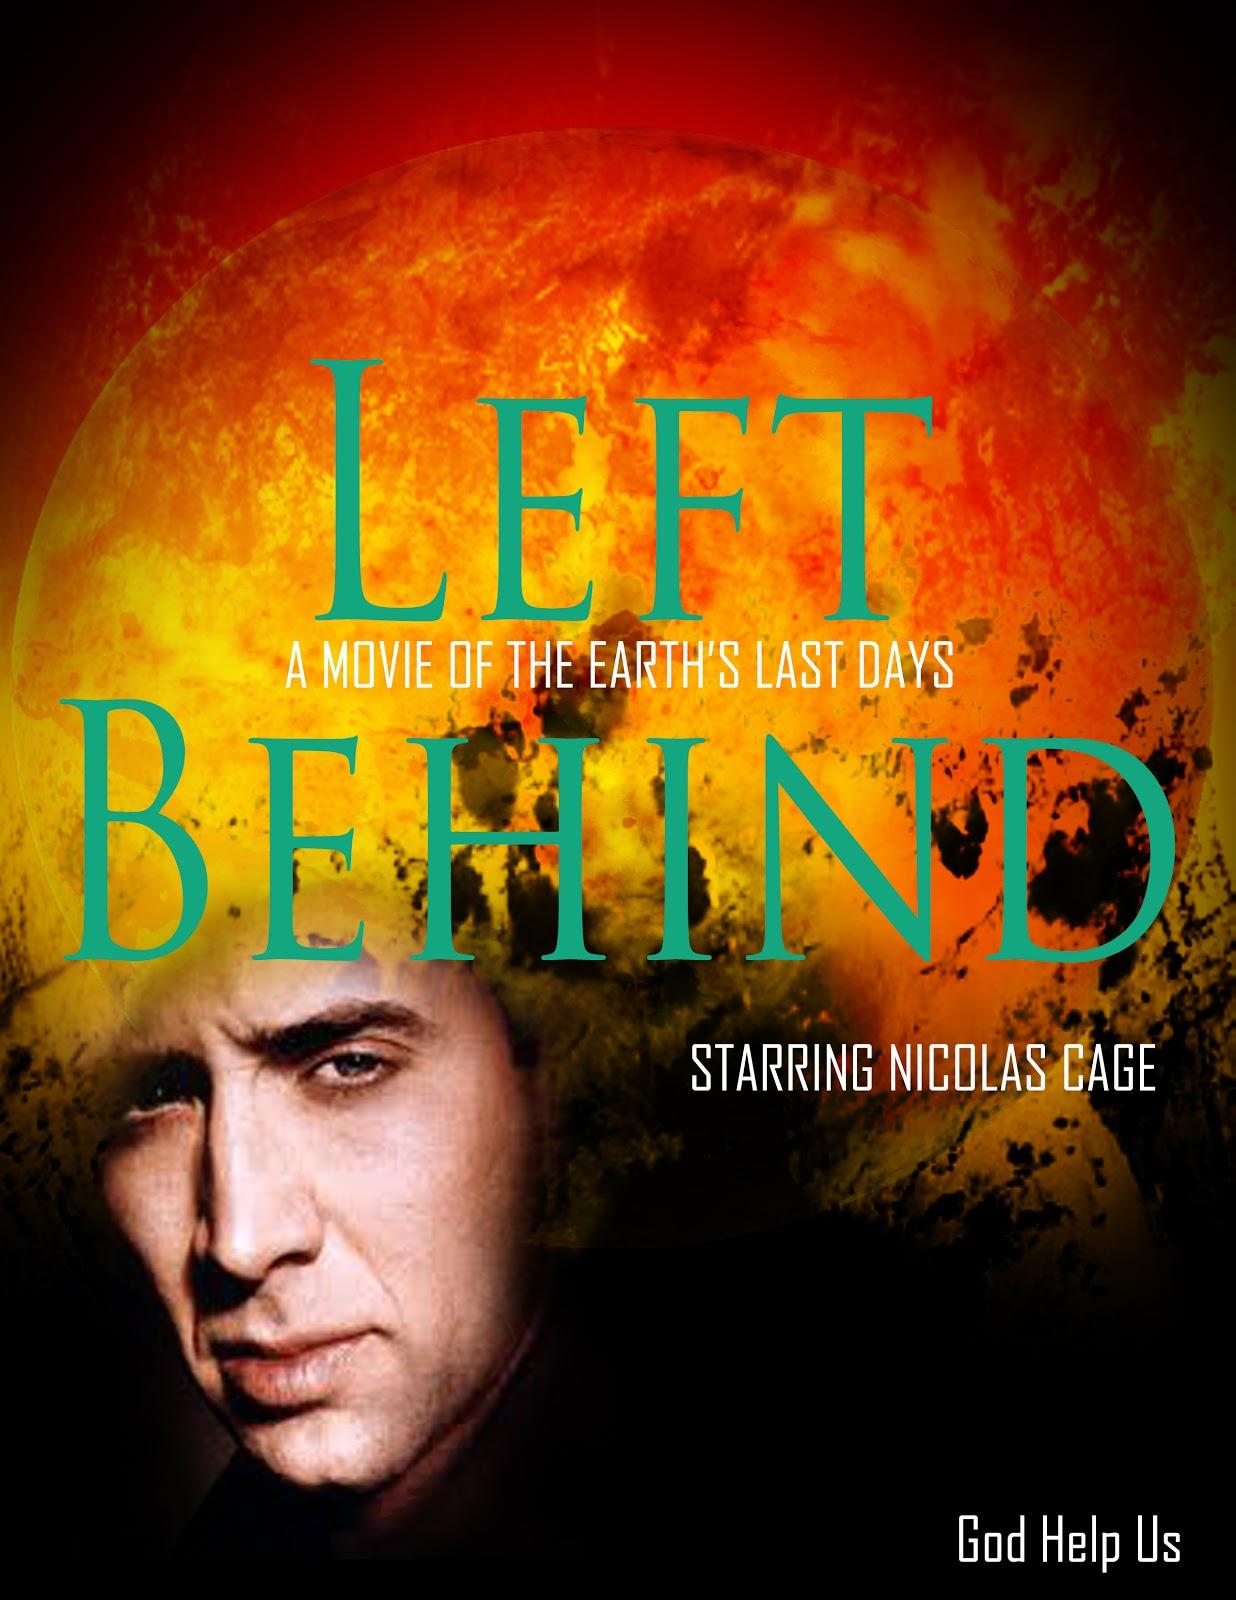 Nicolas+Cage+Left+Behind.jpg